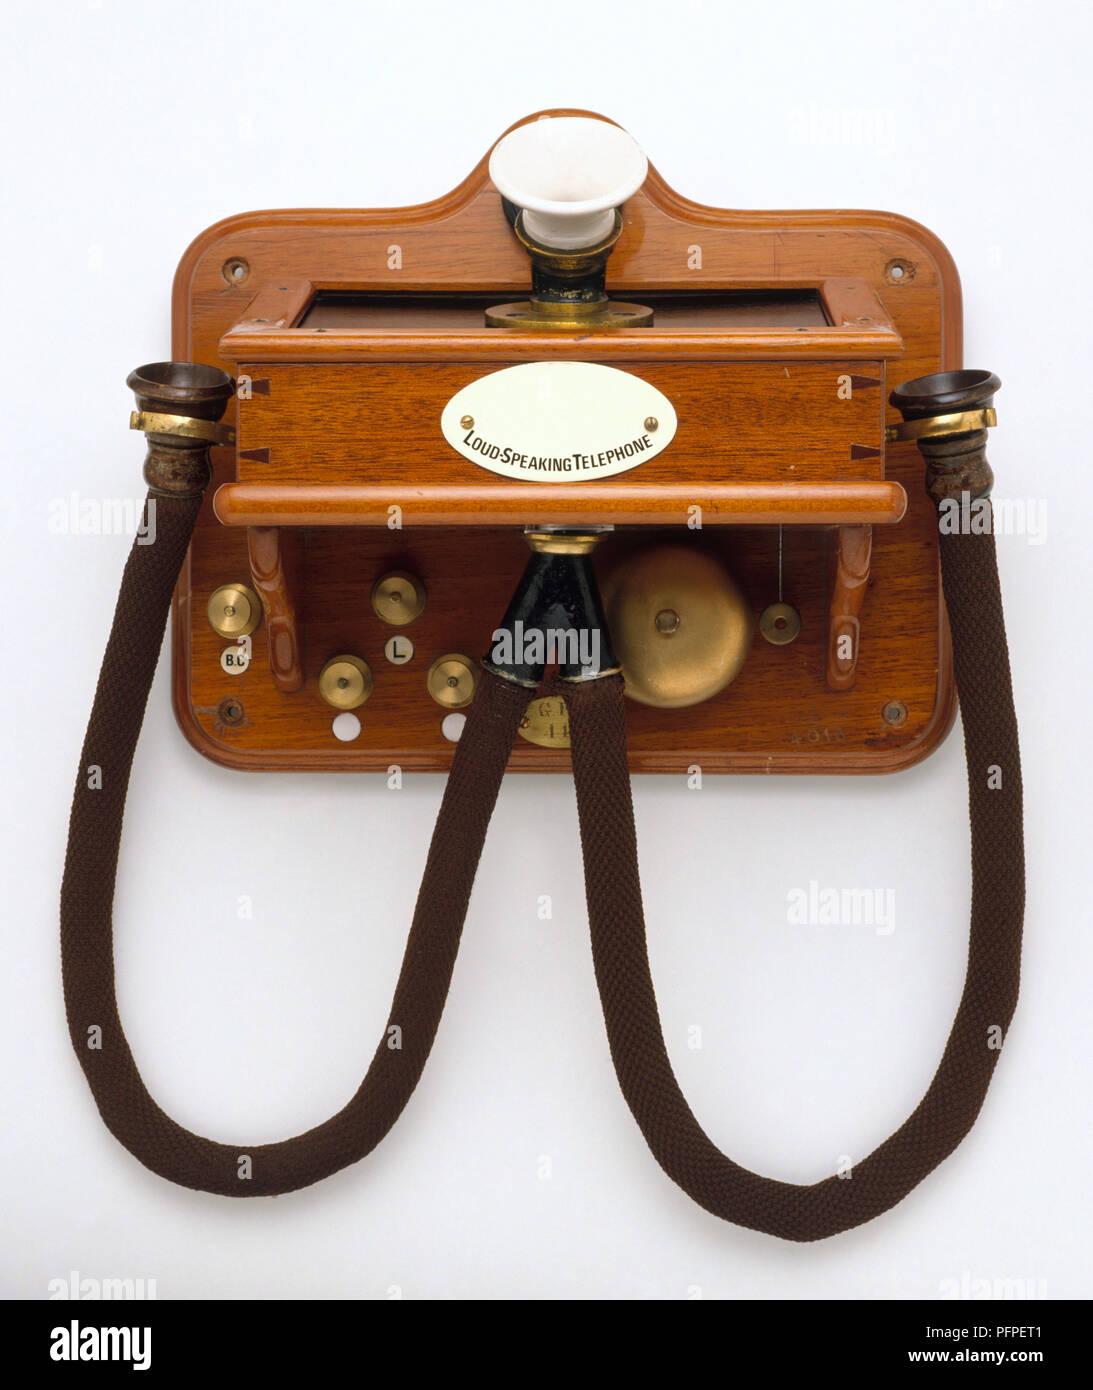 Antique loud speaking telephone - Stock Image